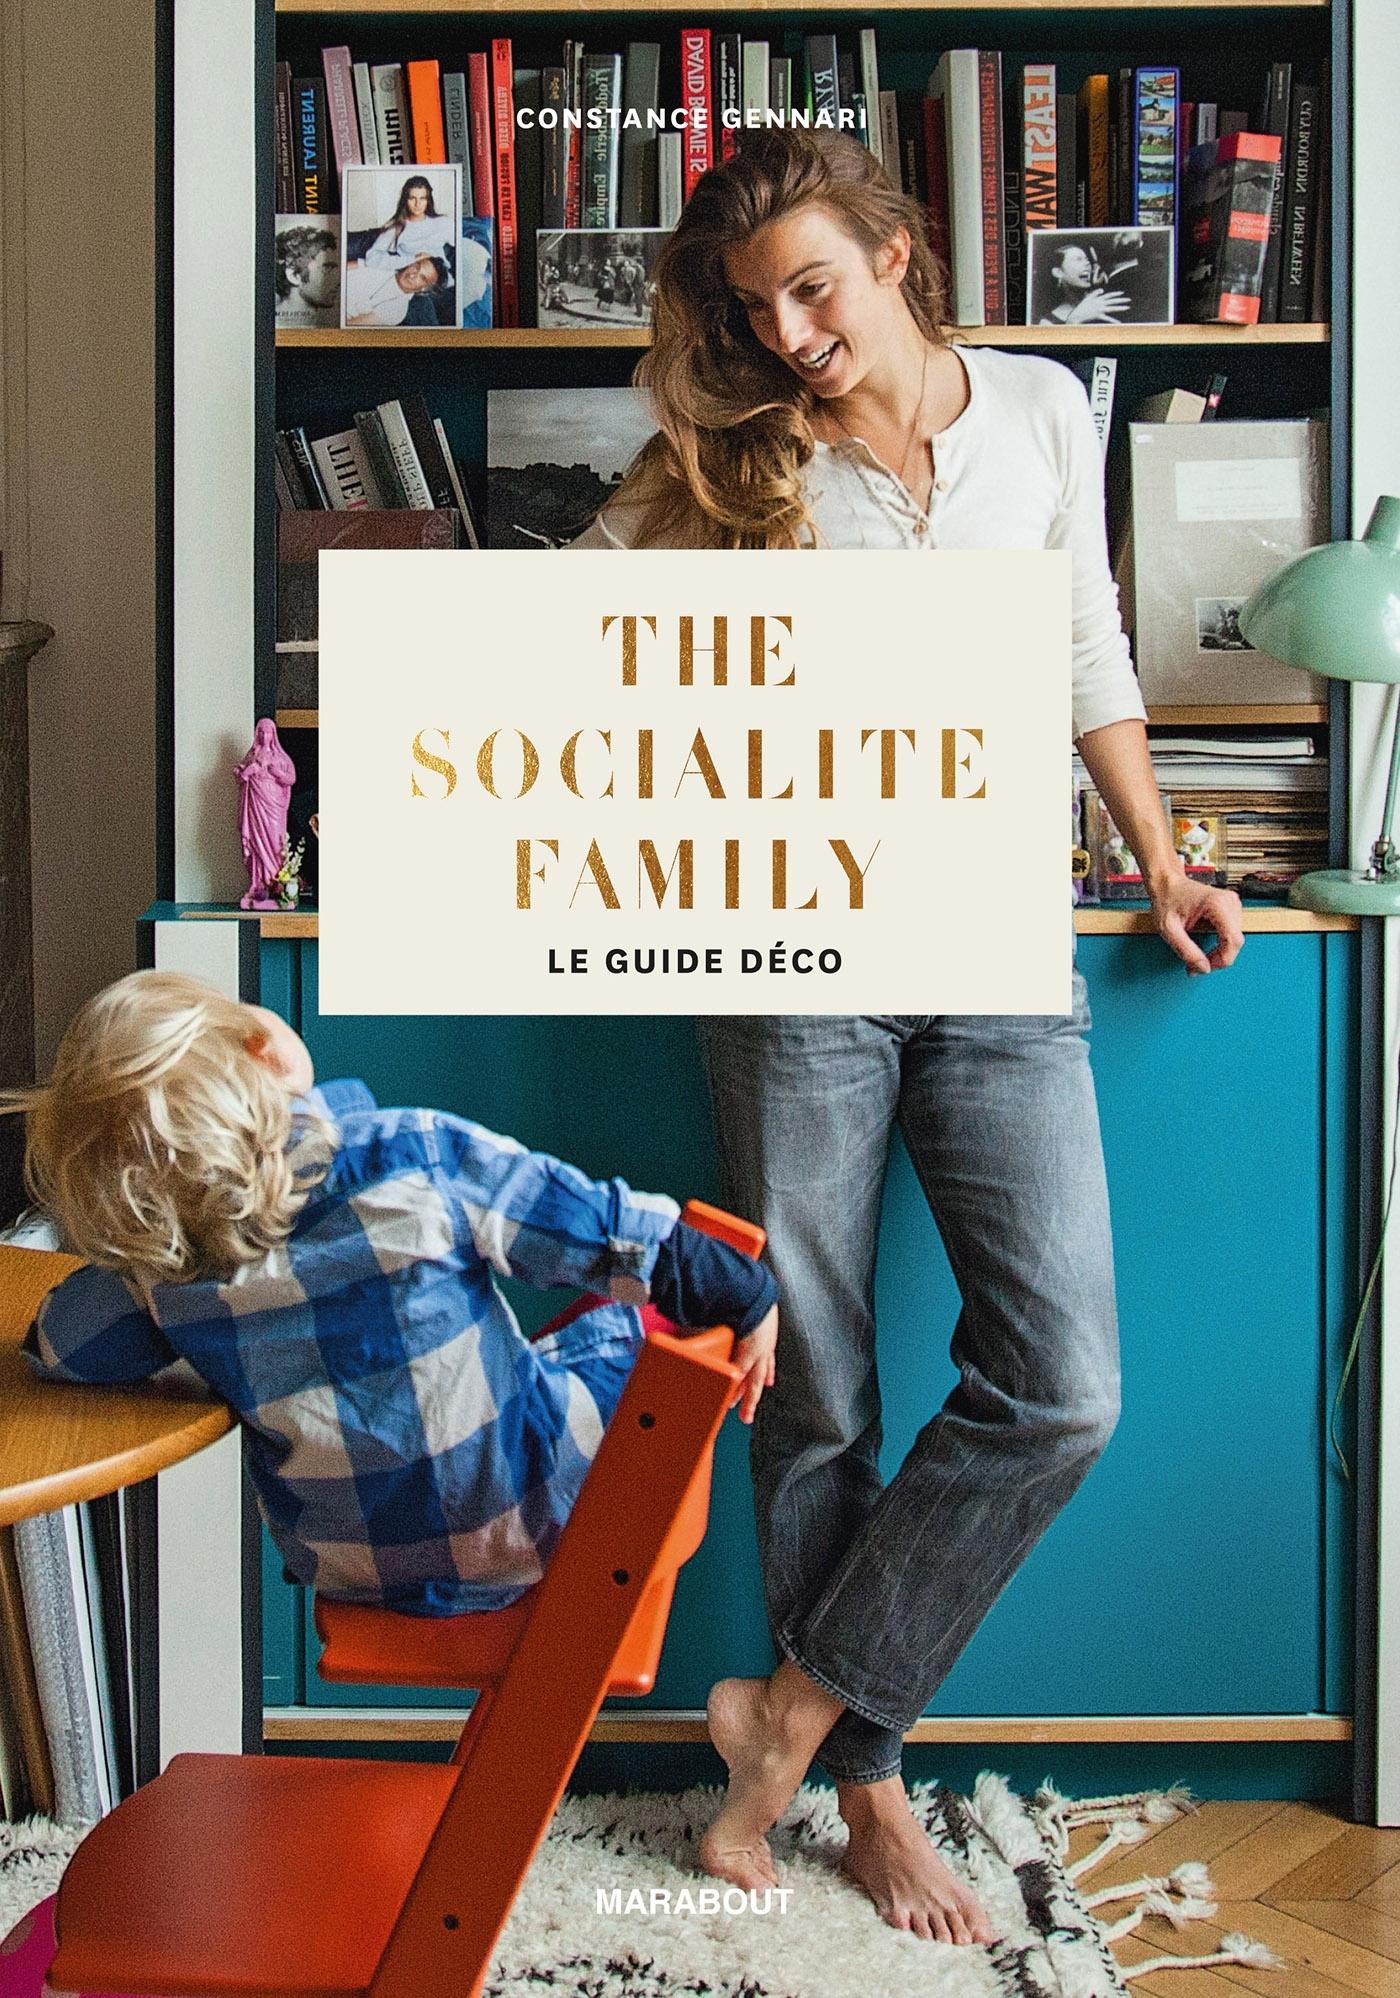 THE SOCIALITE FAMILY LE GUIDE DECO